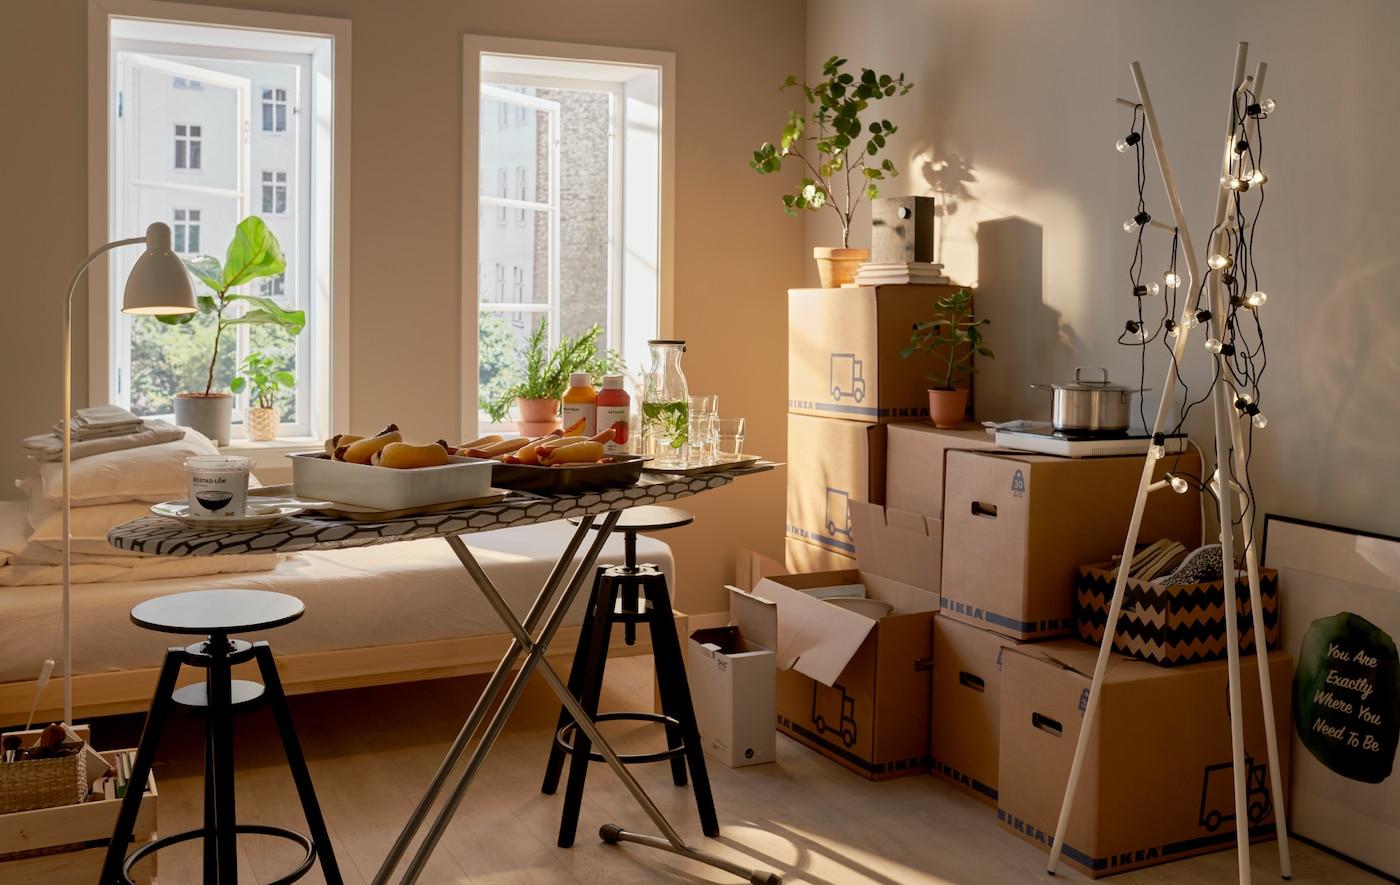 Et rum med flytterod: Stablede flyttekasser, en lille buffet serveret på et strygebræt og en EKRAR stumtjener pyntet med lyskæder.